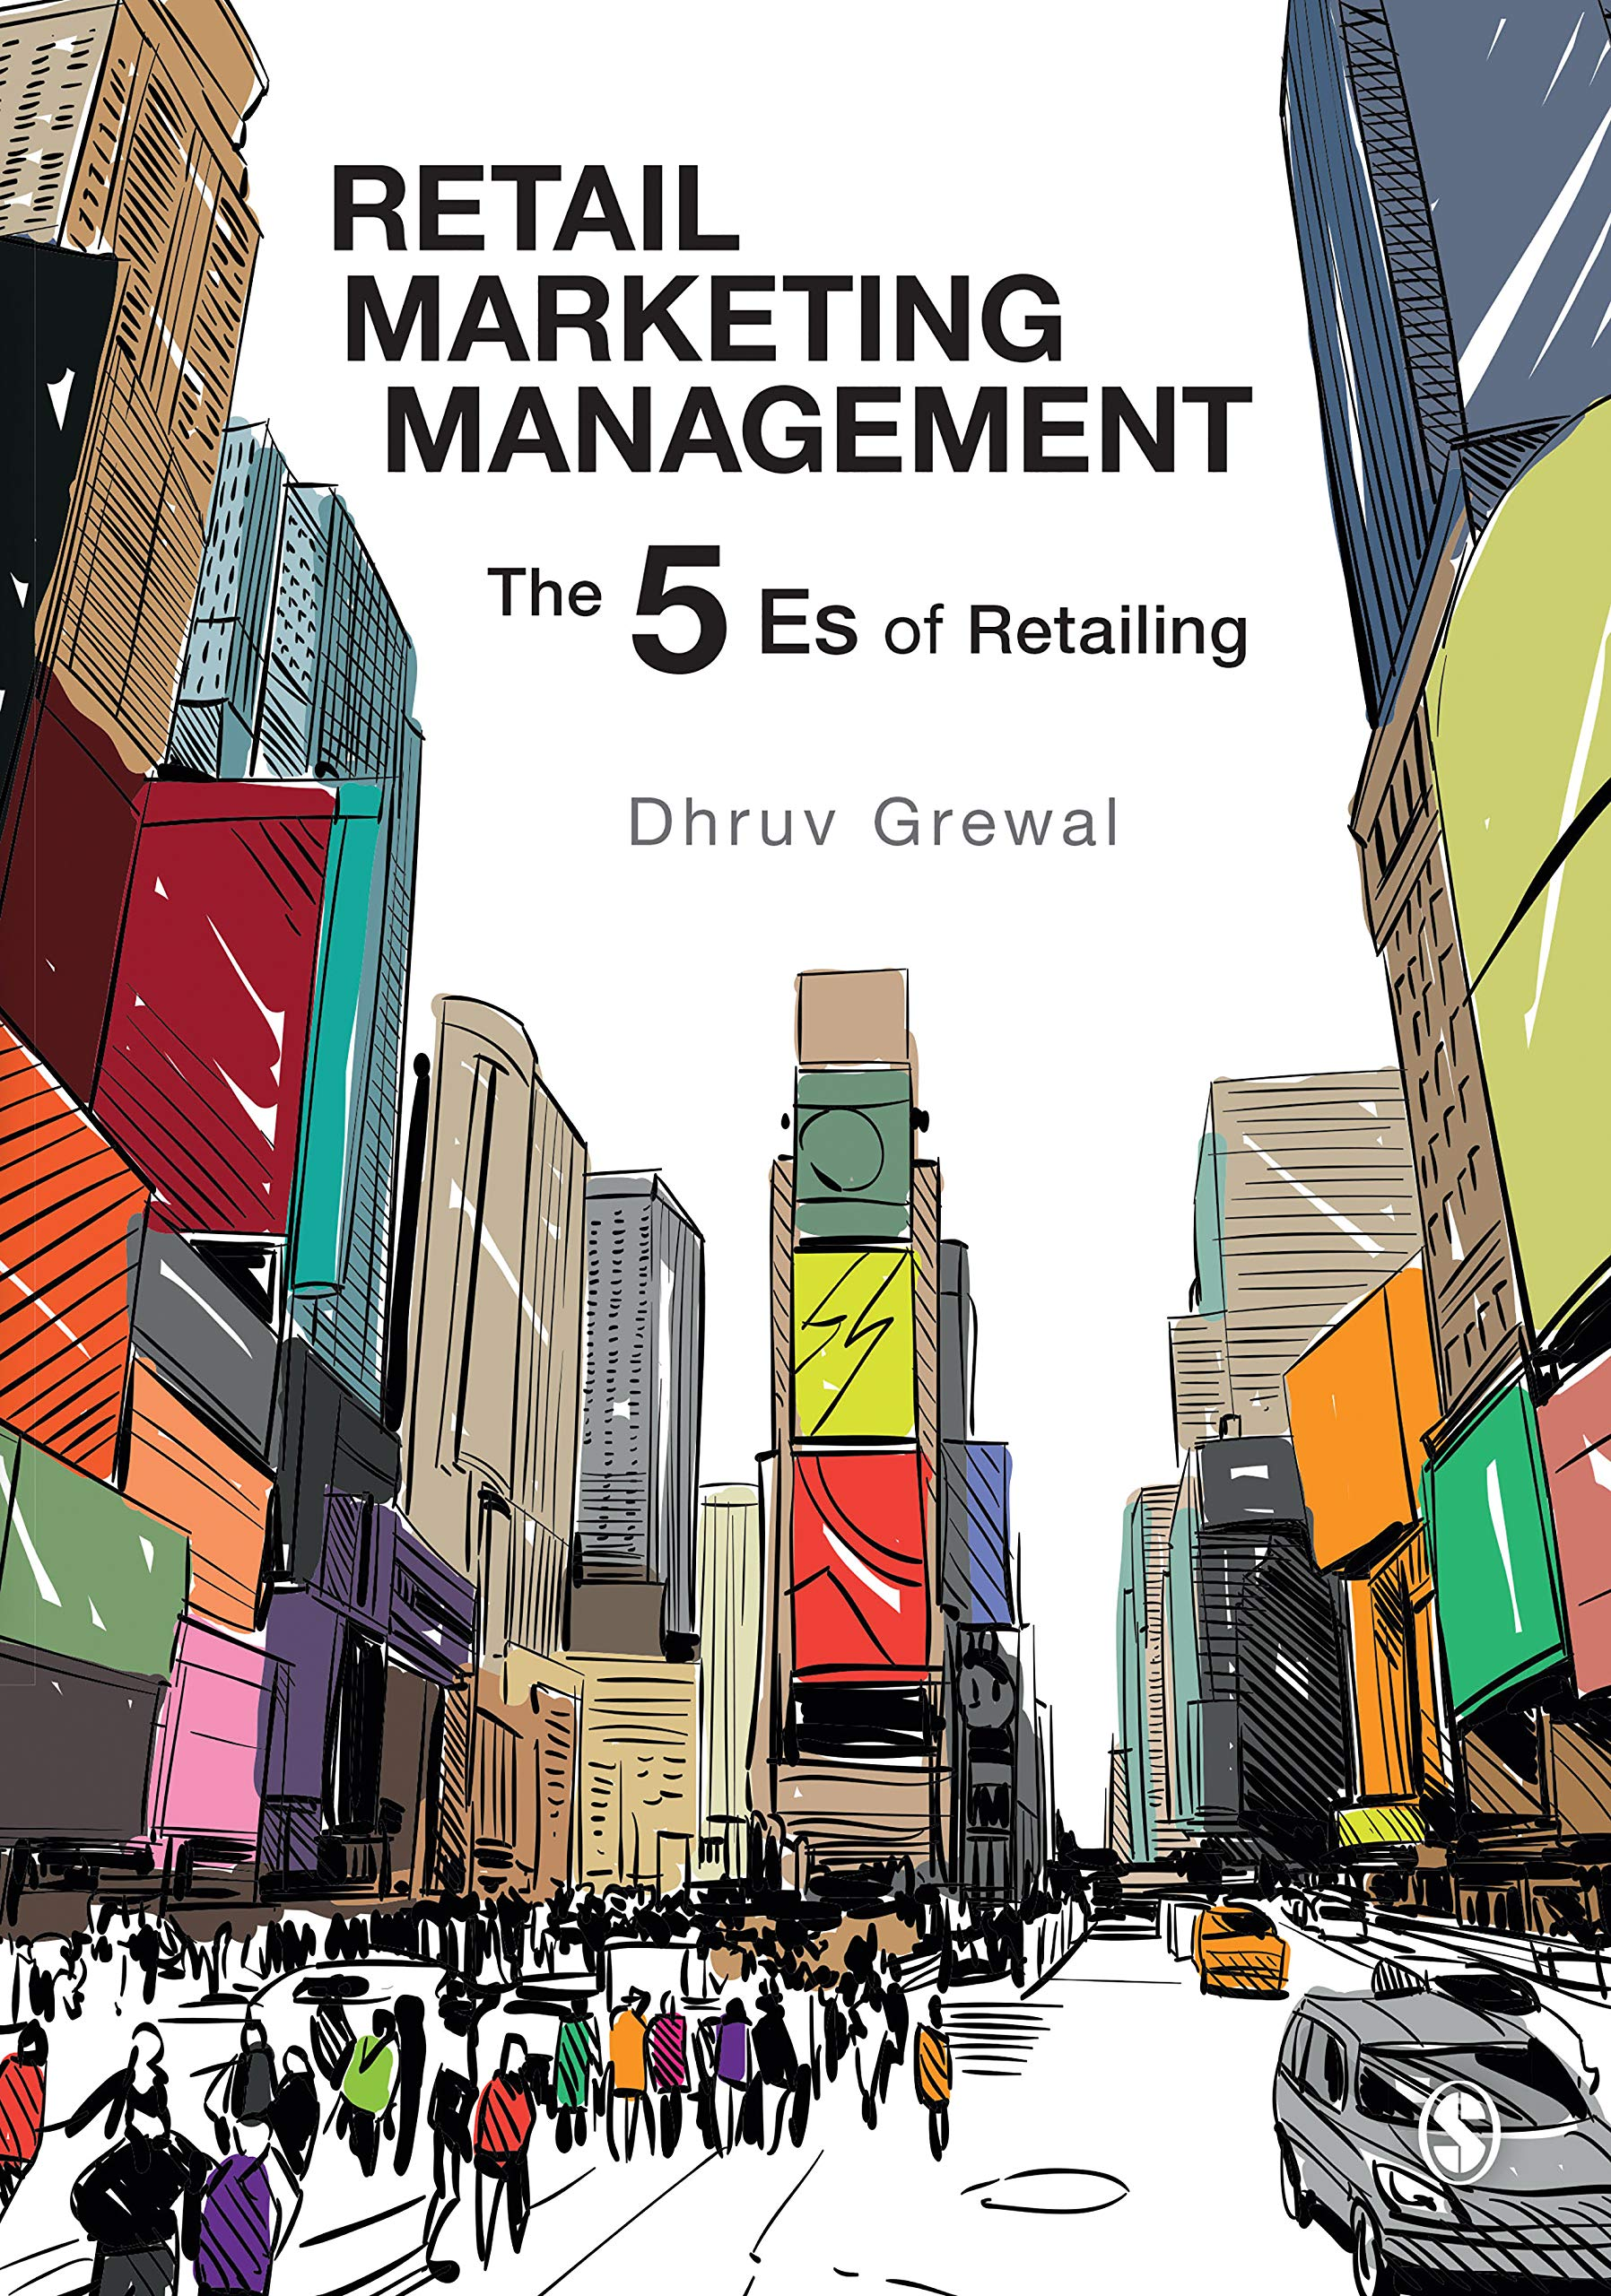 Retail Marketing Management: The 5 Es of Retailing